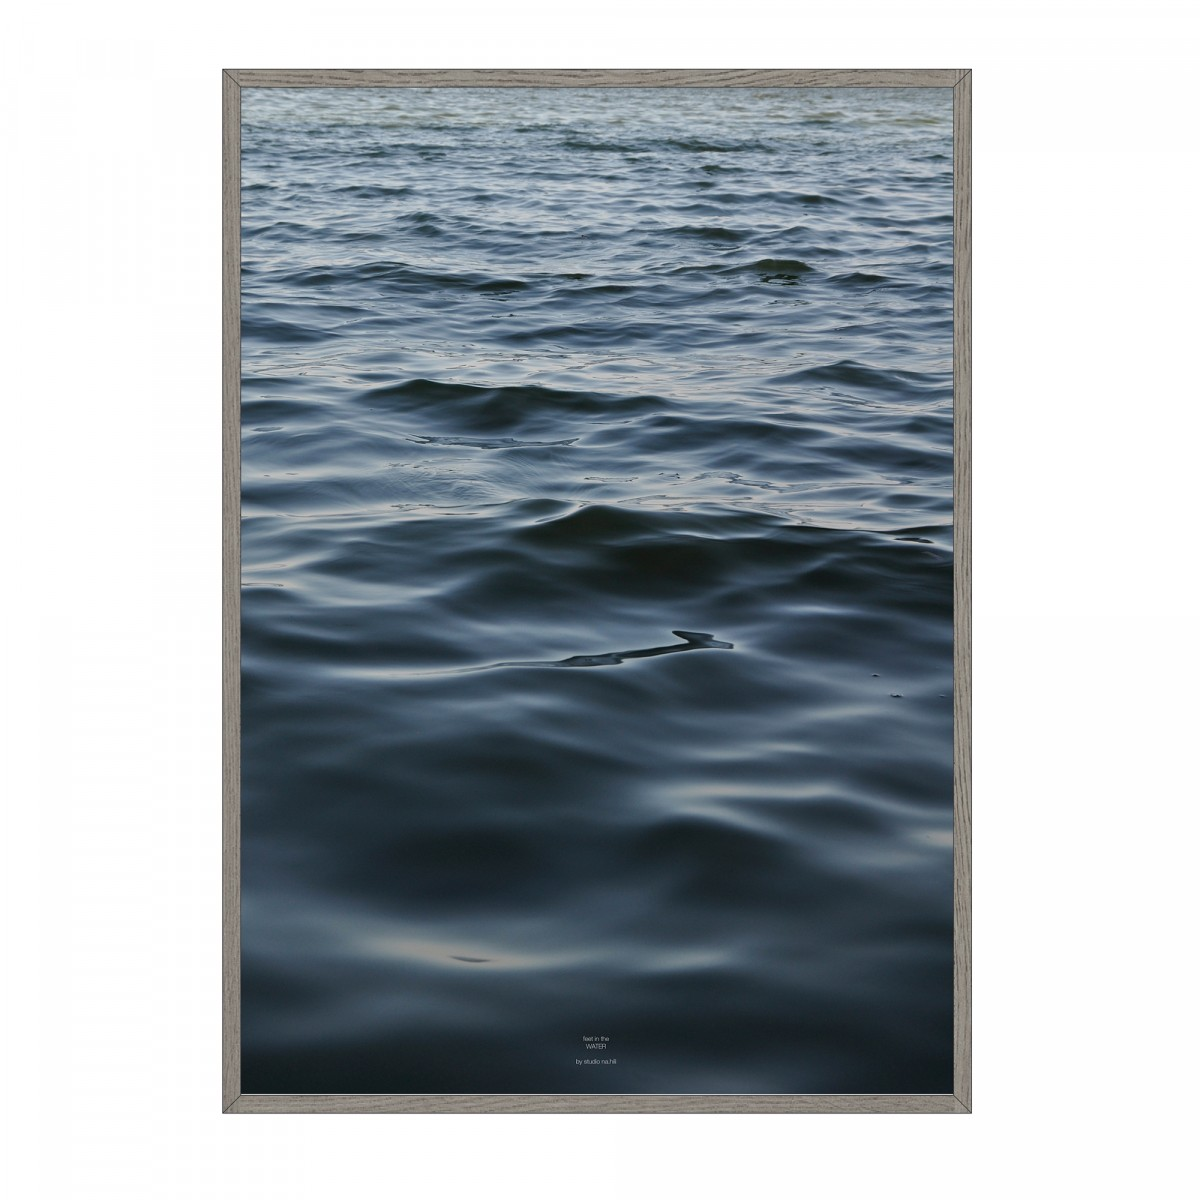 na.hili feet in the WATER - A1 Artprint - Poster